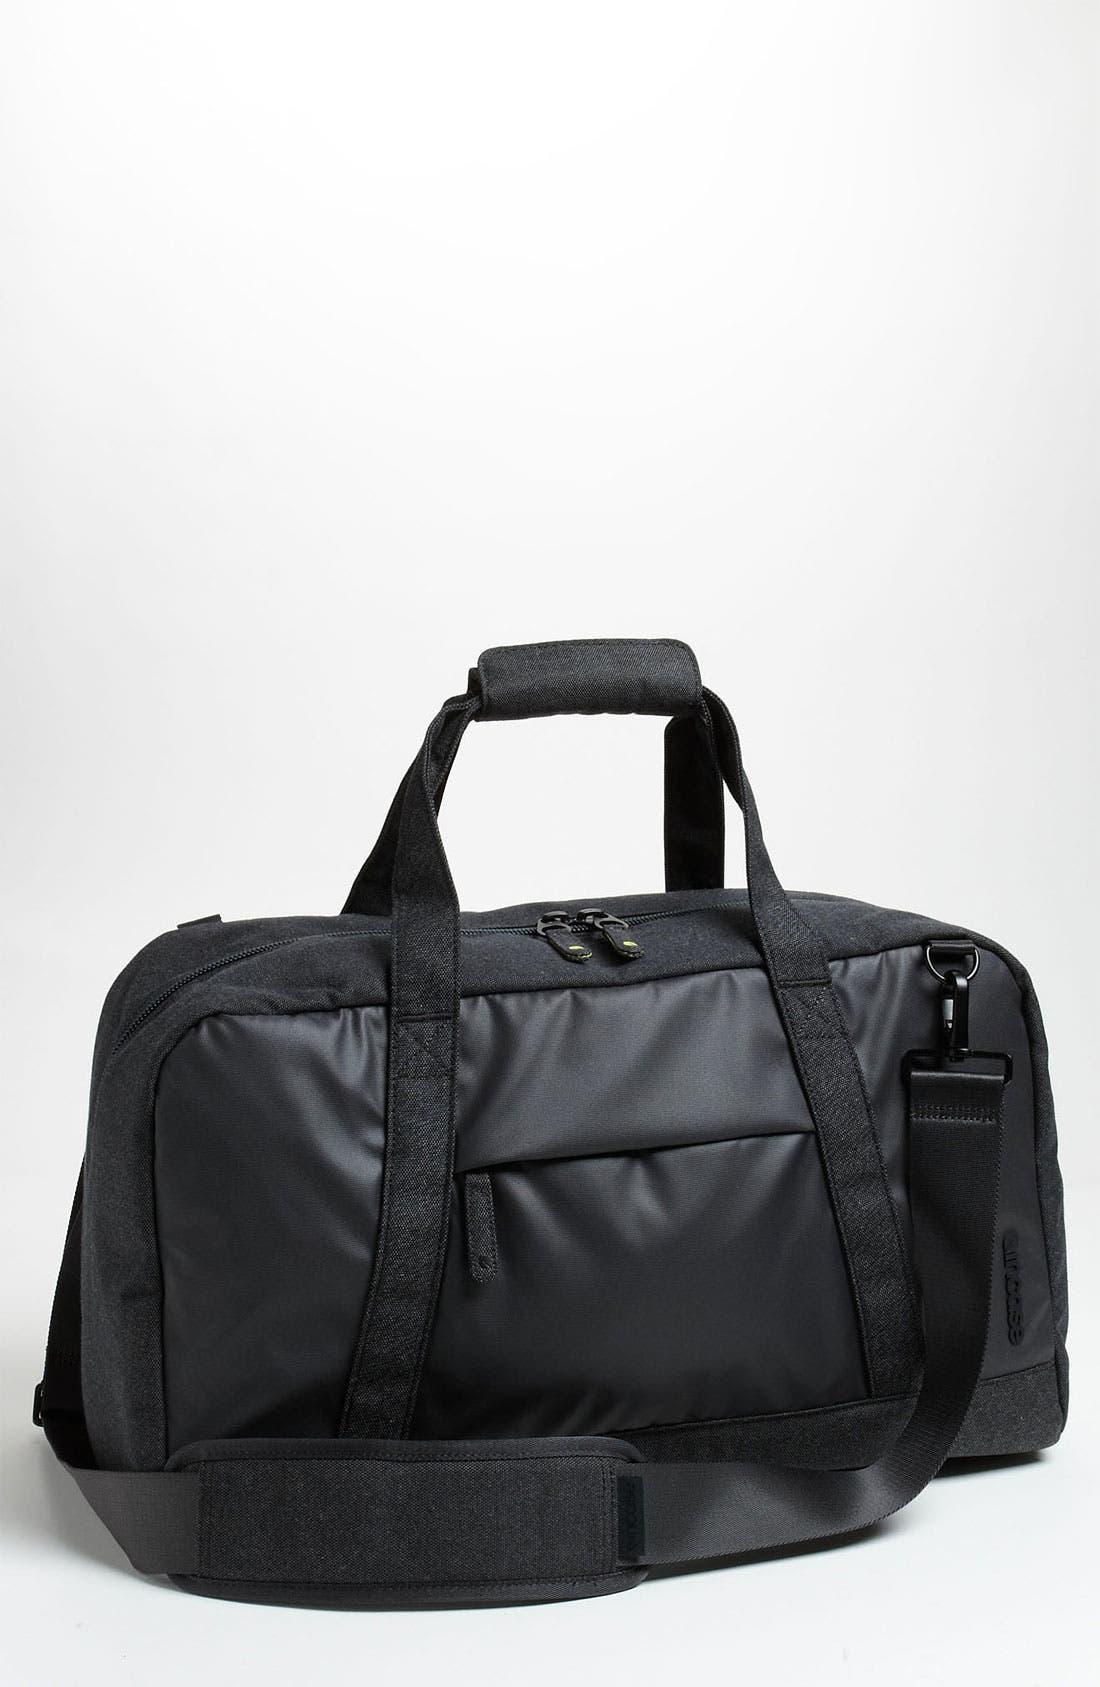 Incase 'EO' Travel Duffel Bag,                             Main thumbnail 1, color,                             001